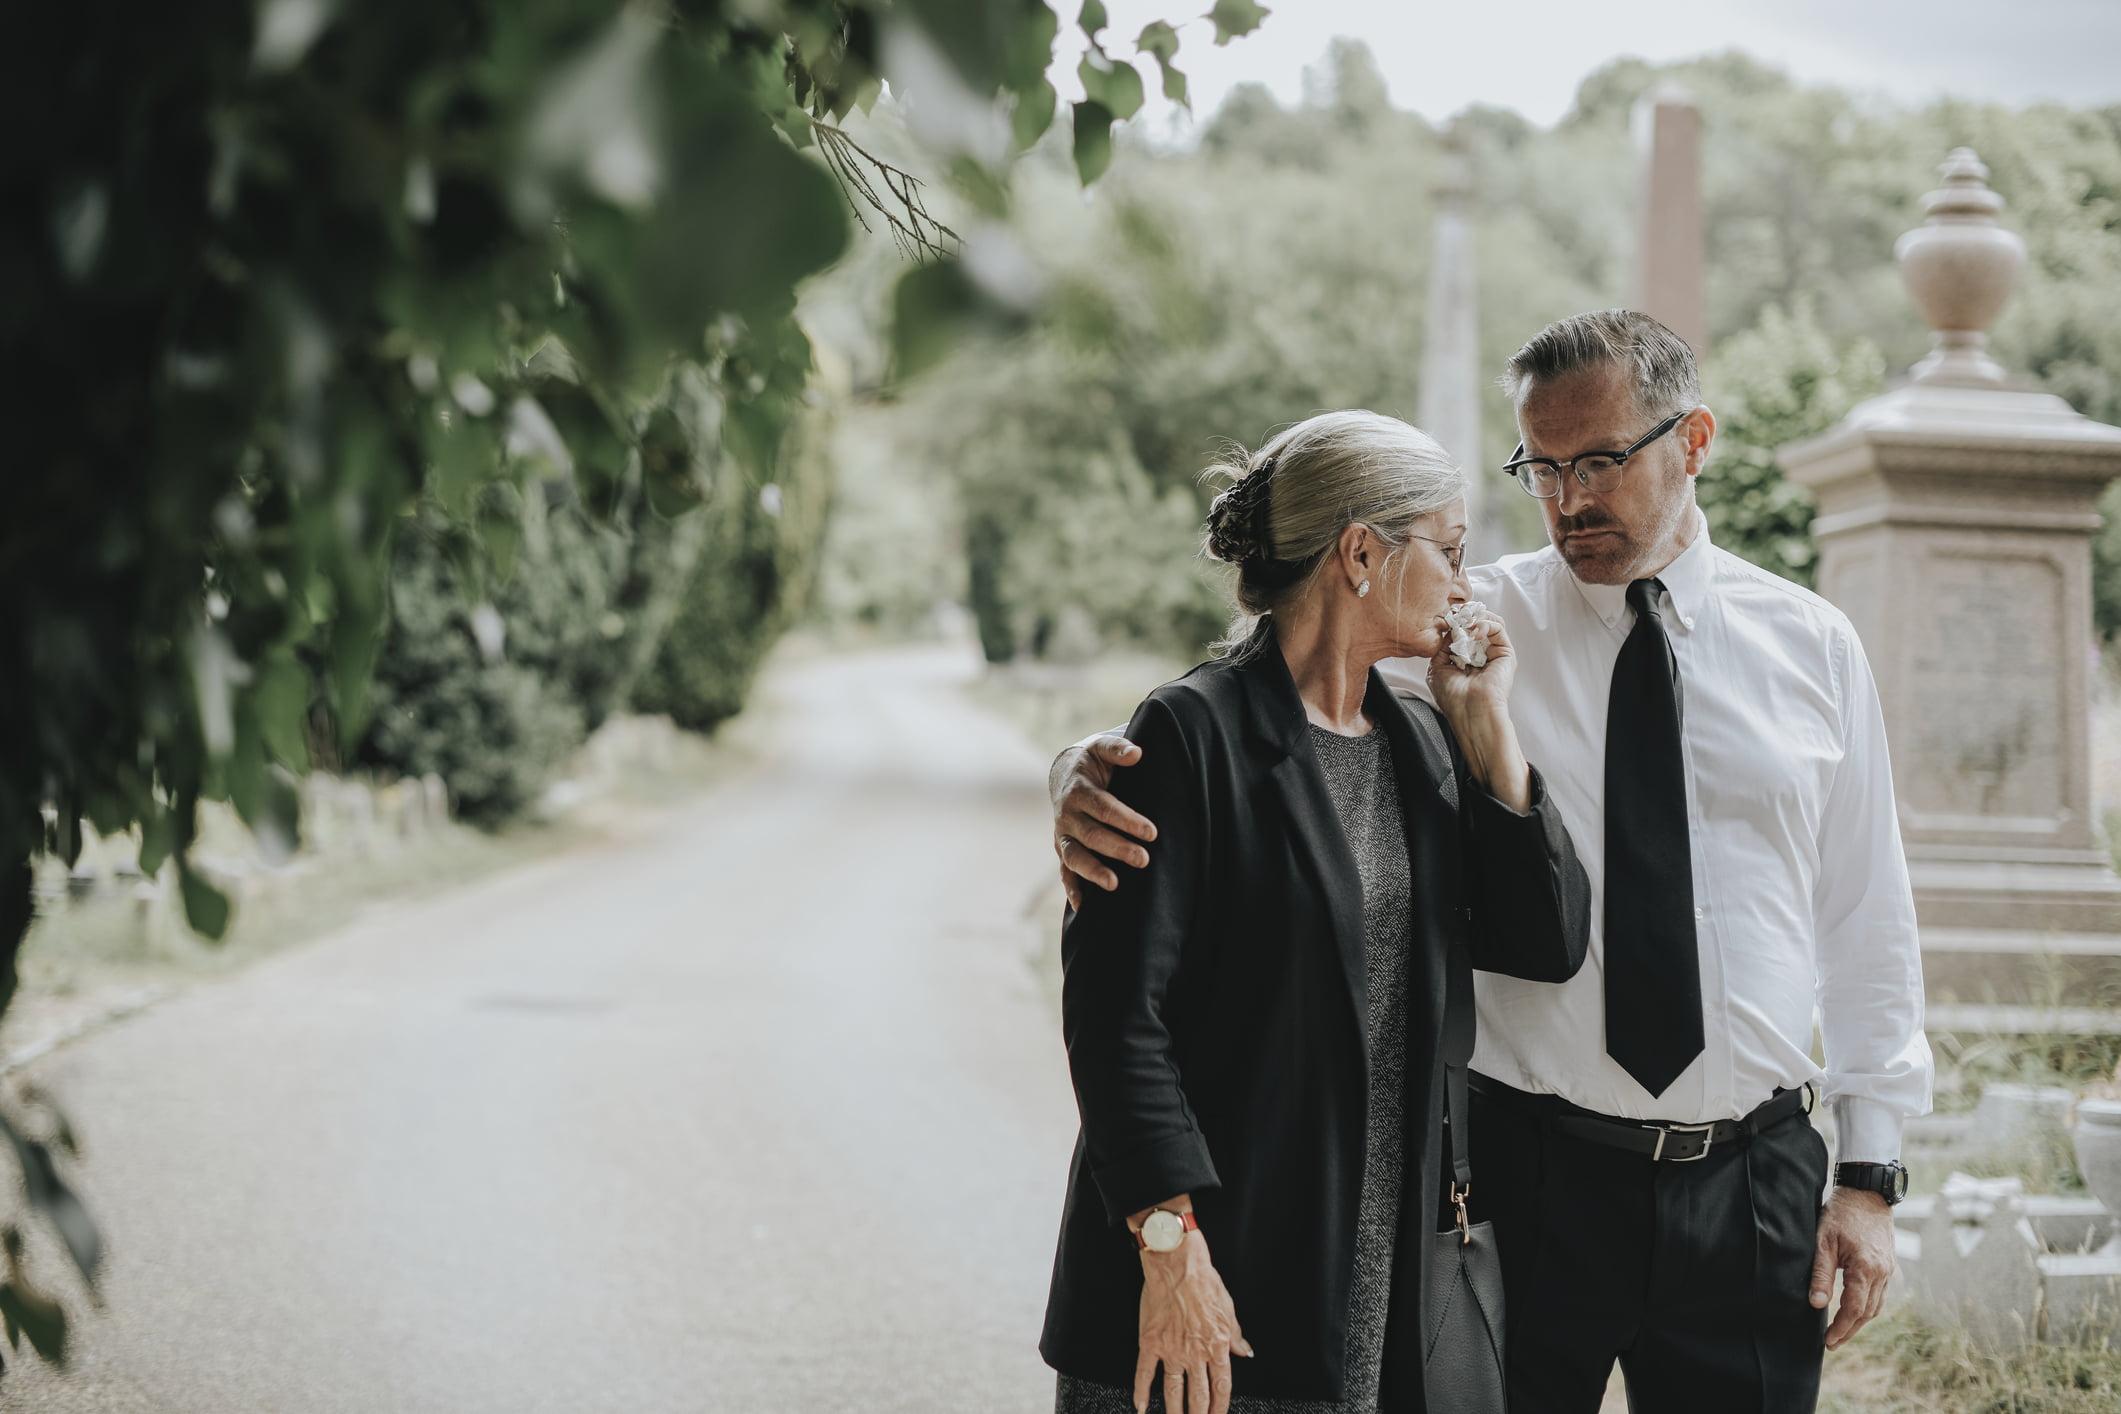 Grief & bereavement